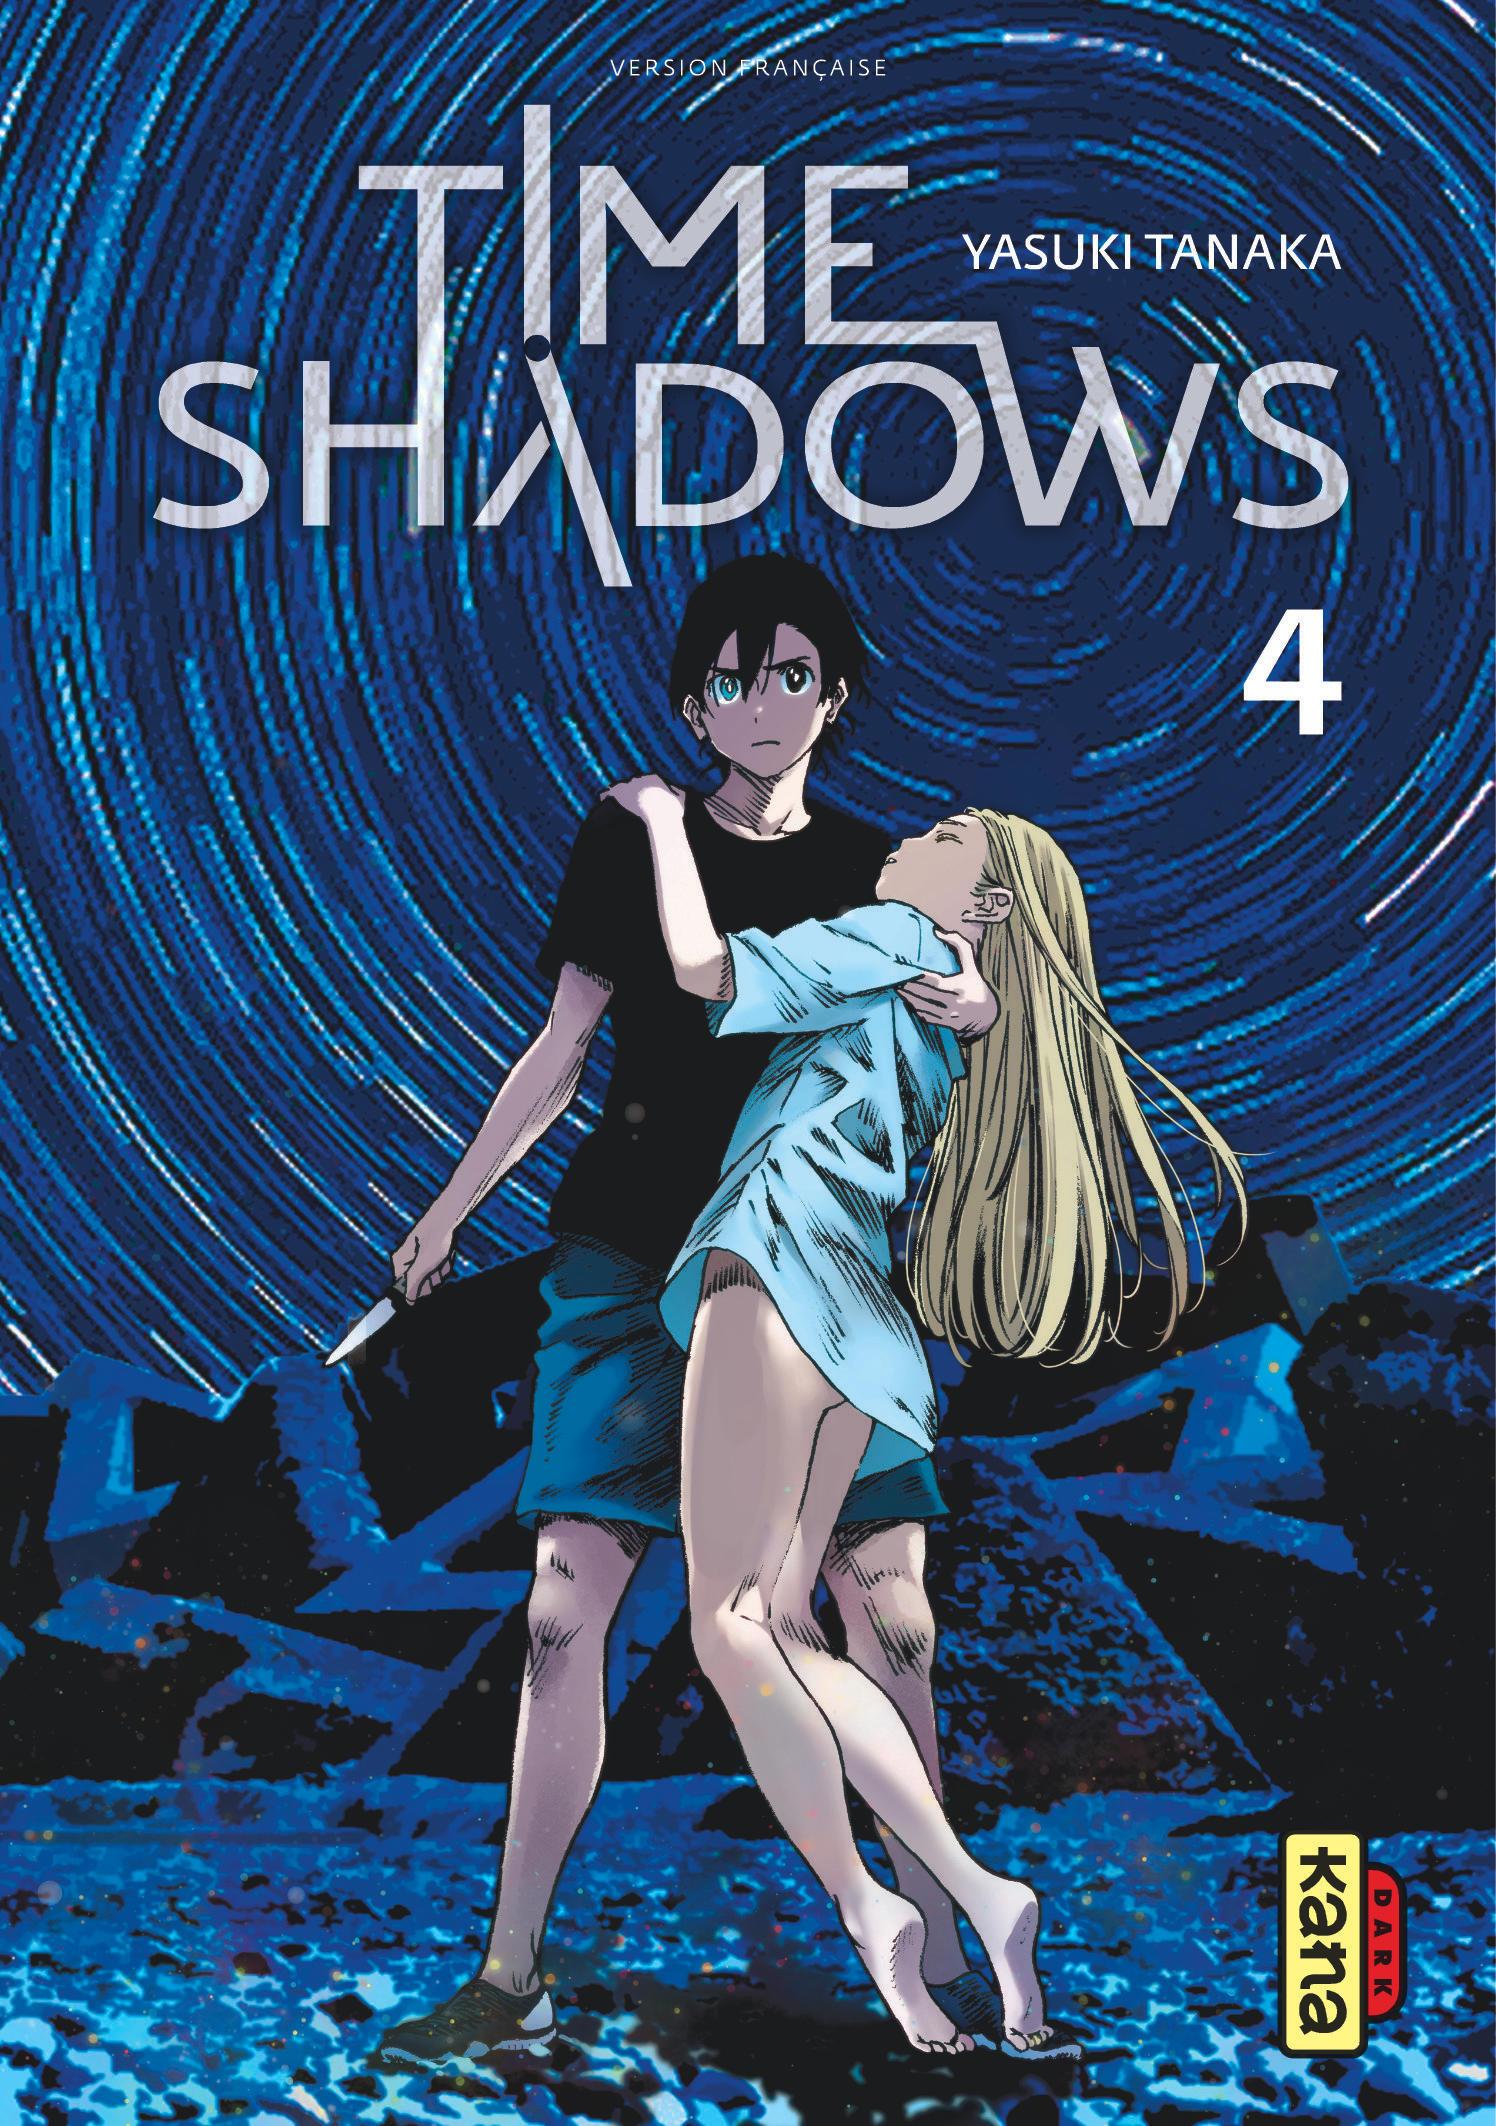 Time Shadows 4